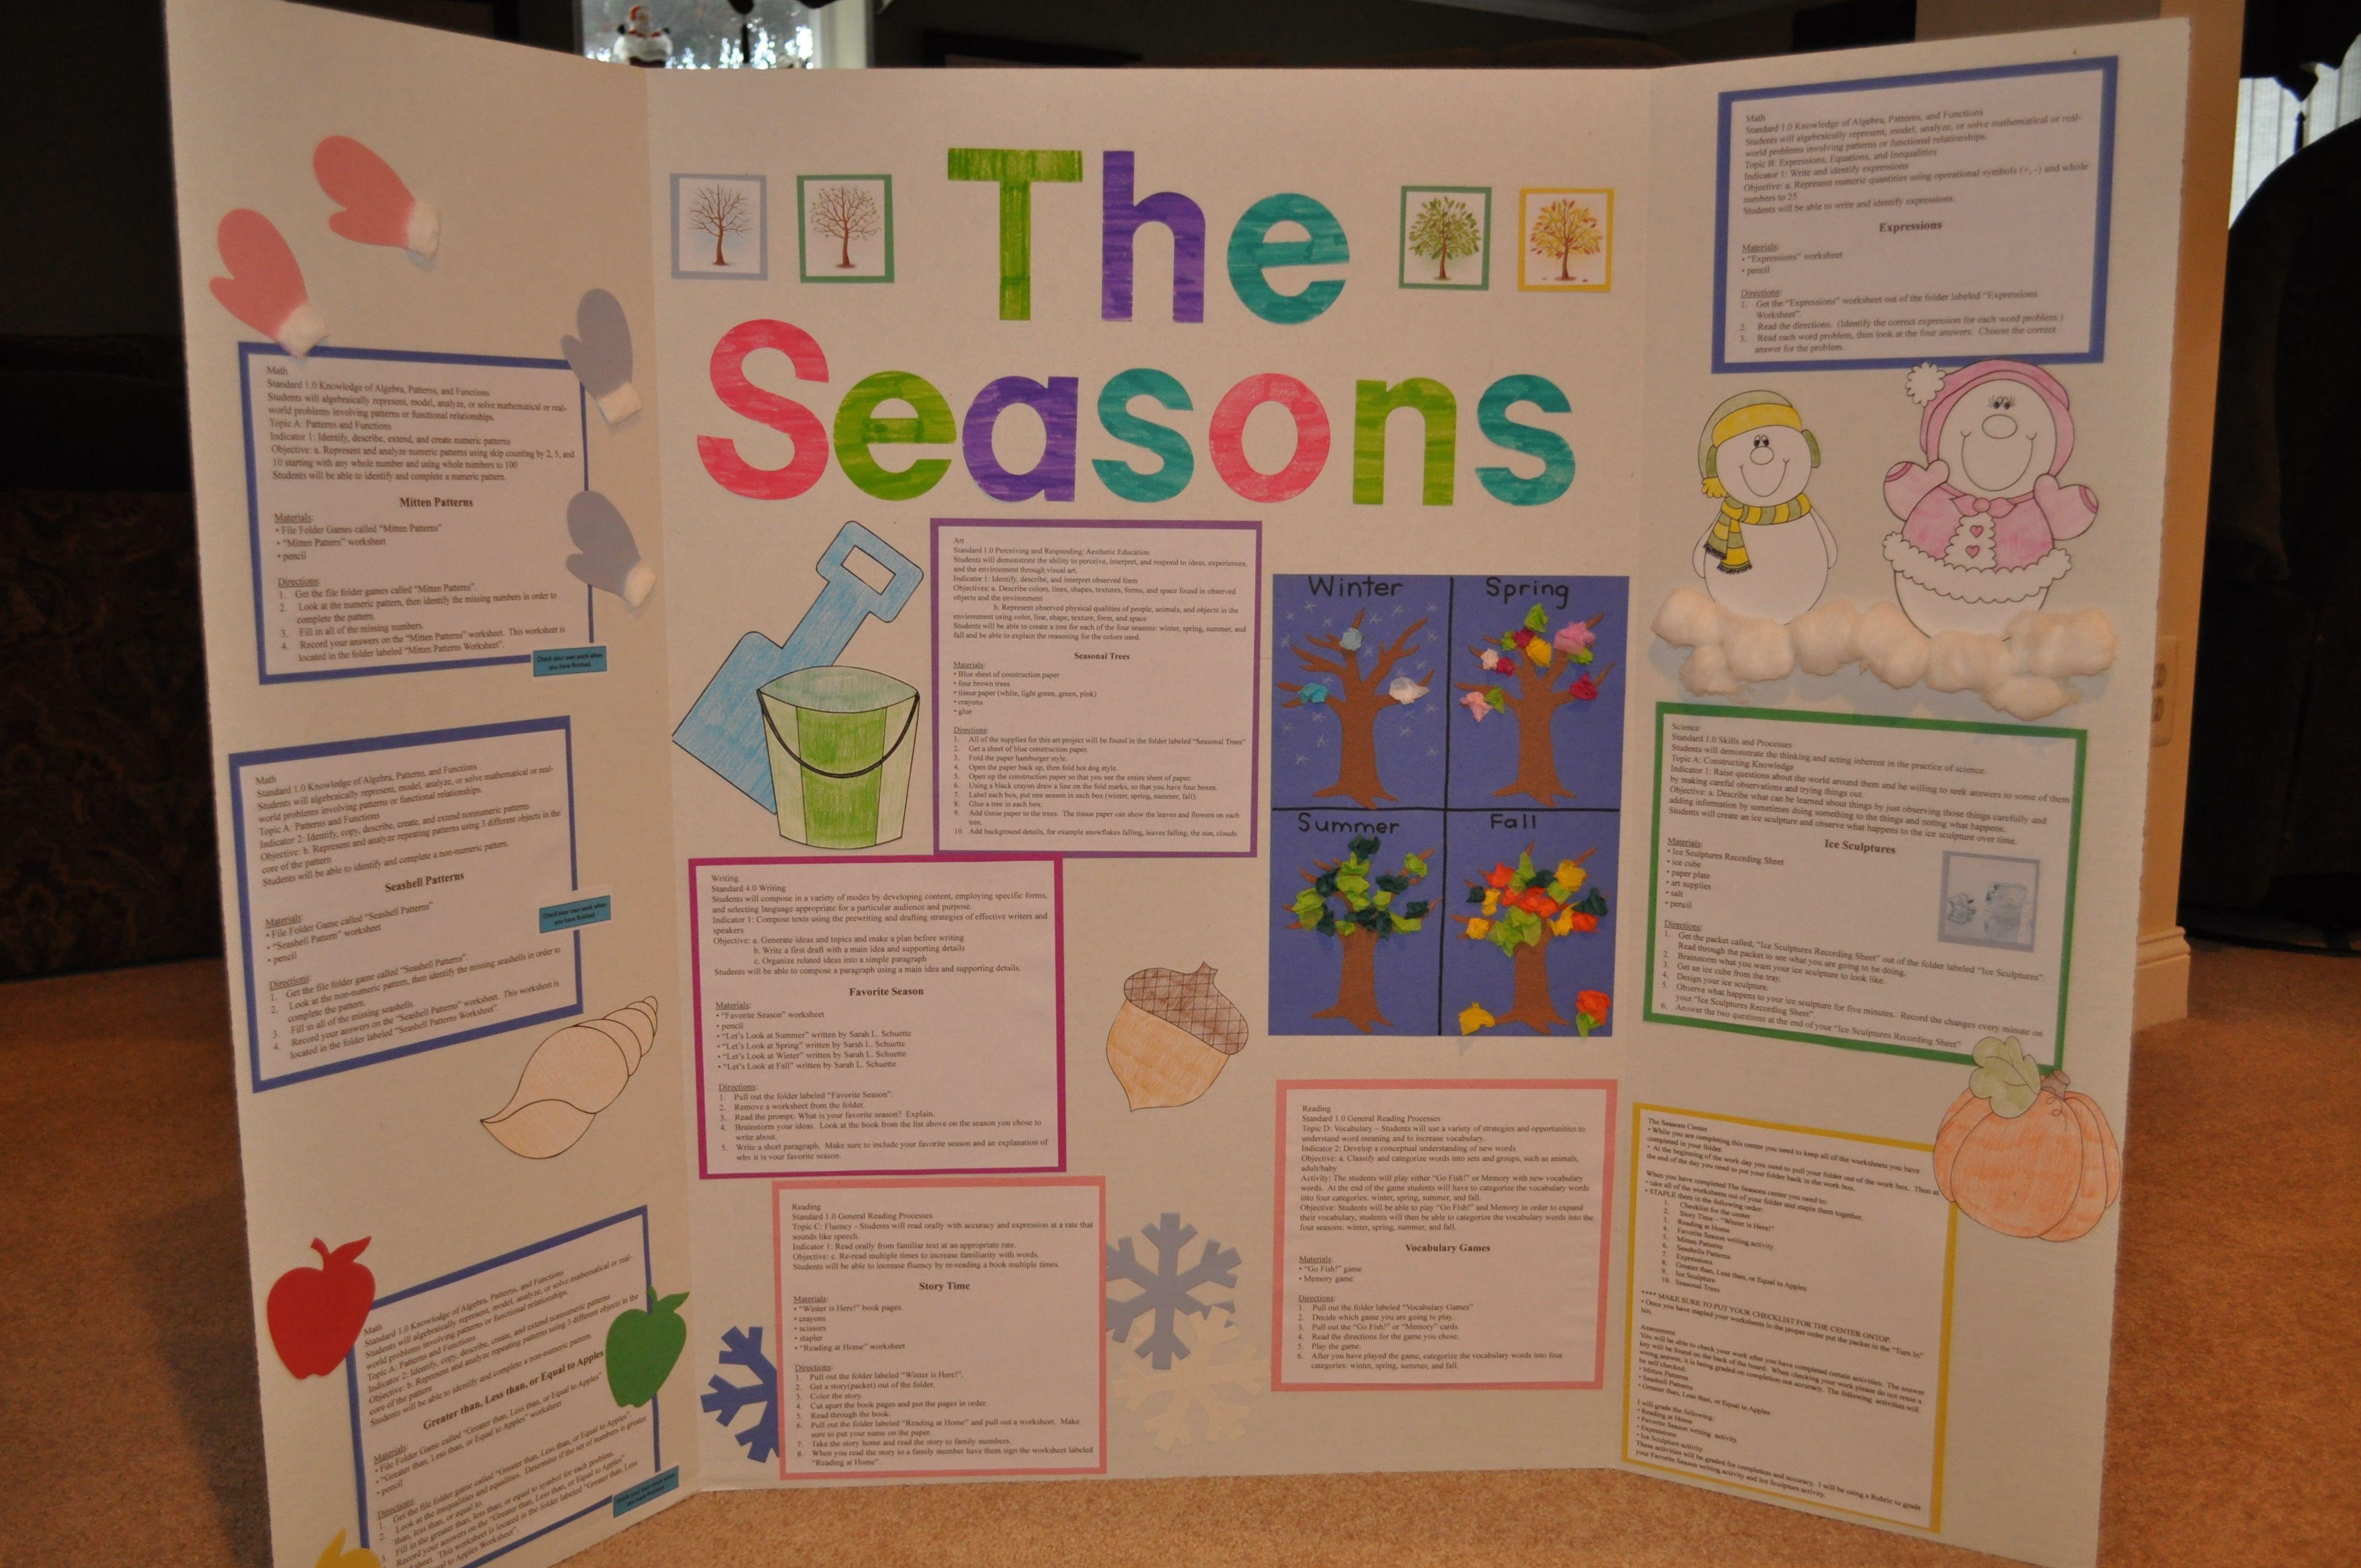 The Season S Literacy Center Math Activities Make Non Numeric Patterns Using A Seashell File Folder Game Mak Seasons Activities Science Themes School Themes